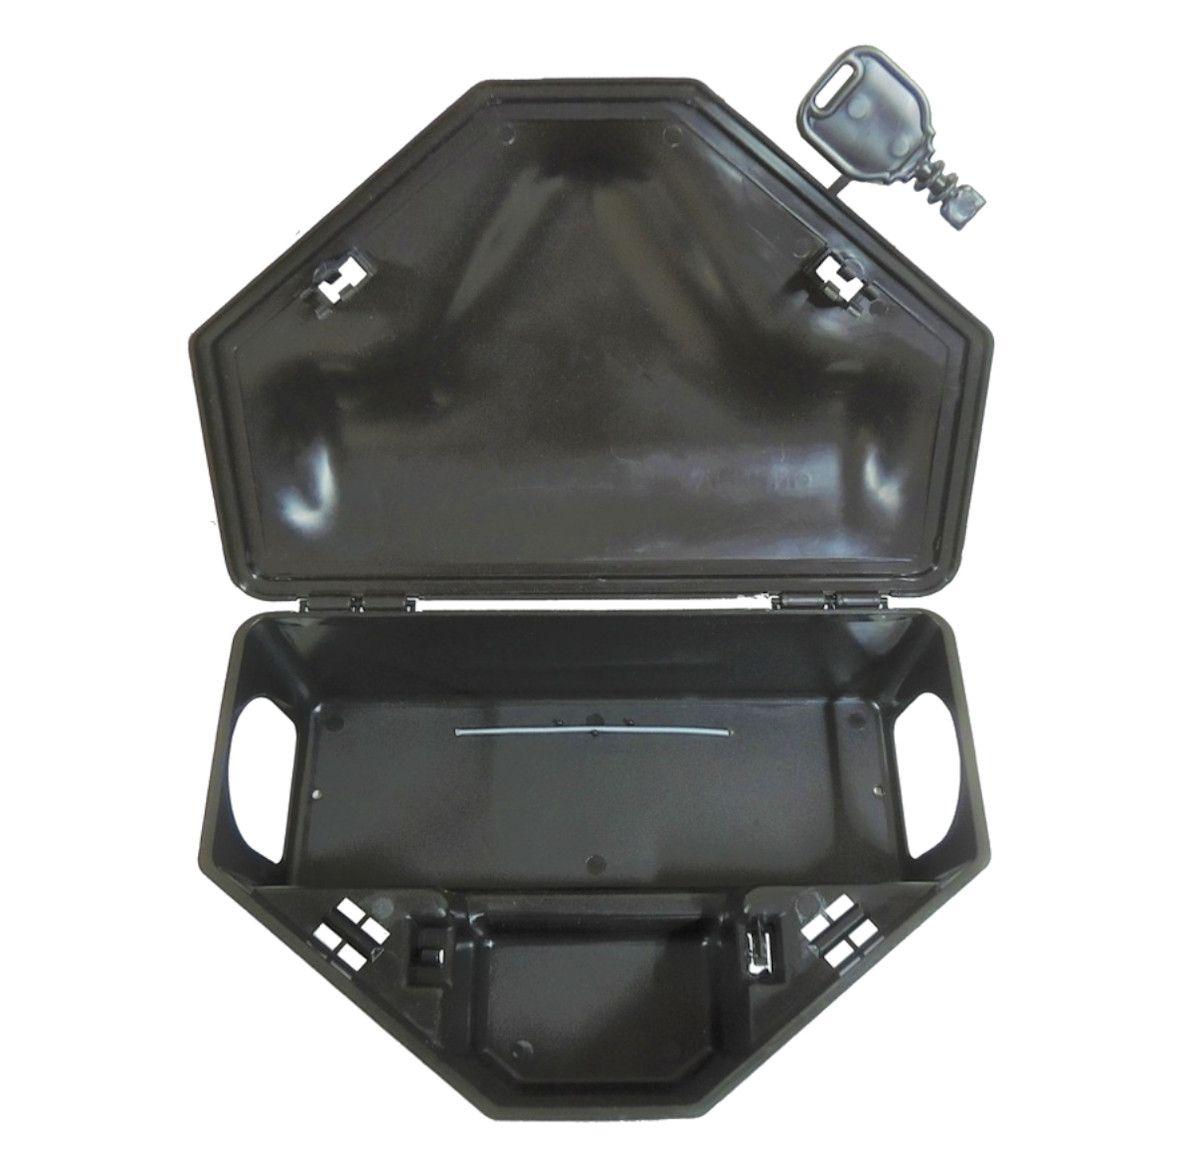 Kit 32 Porta Isca Com 2 Chaves - Duplo Travamento